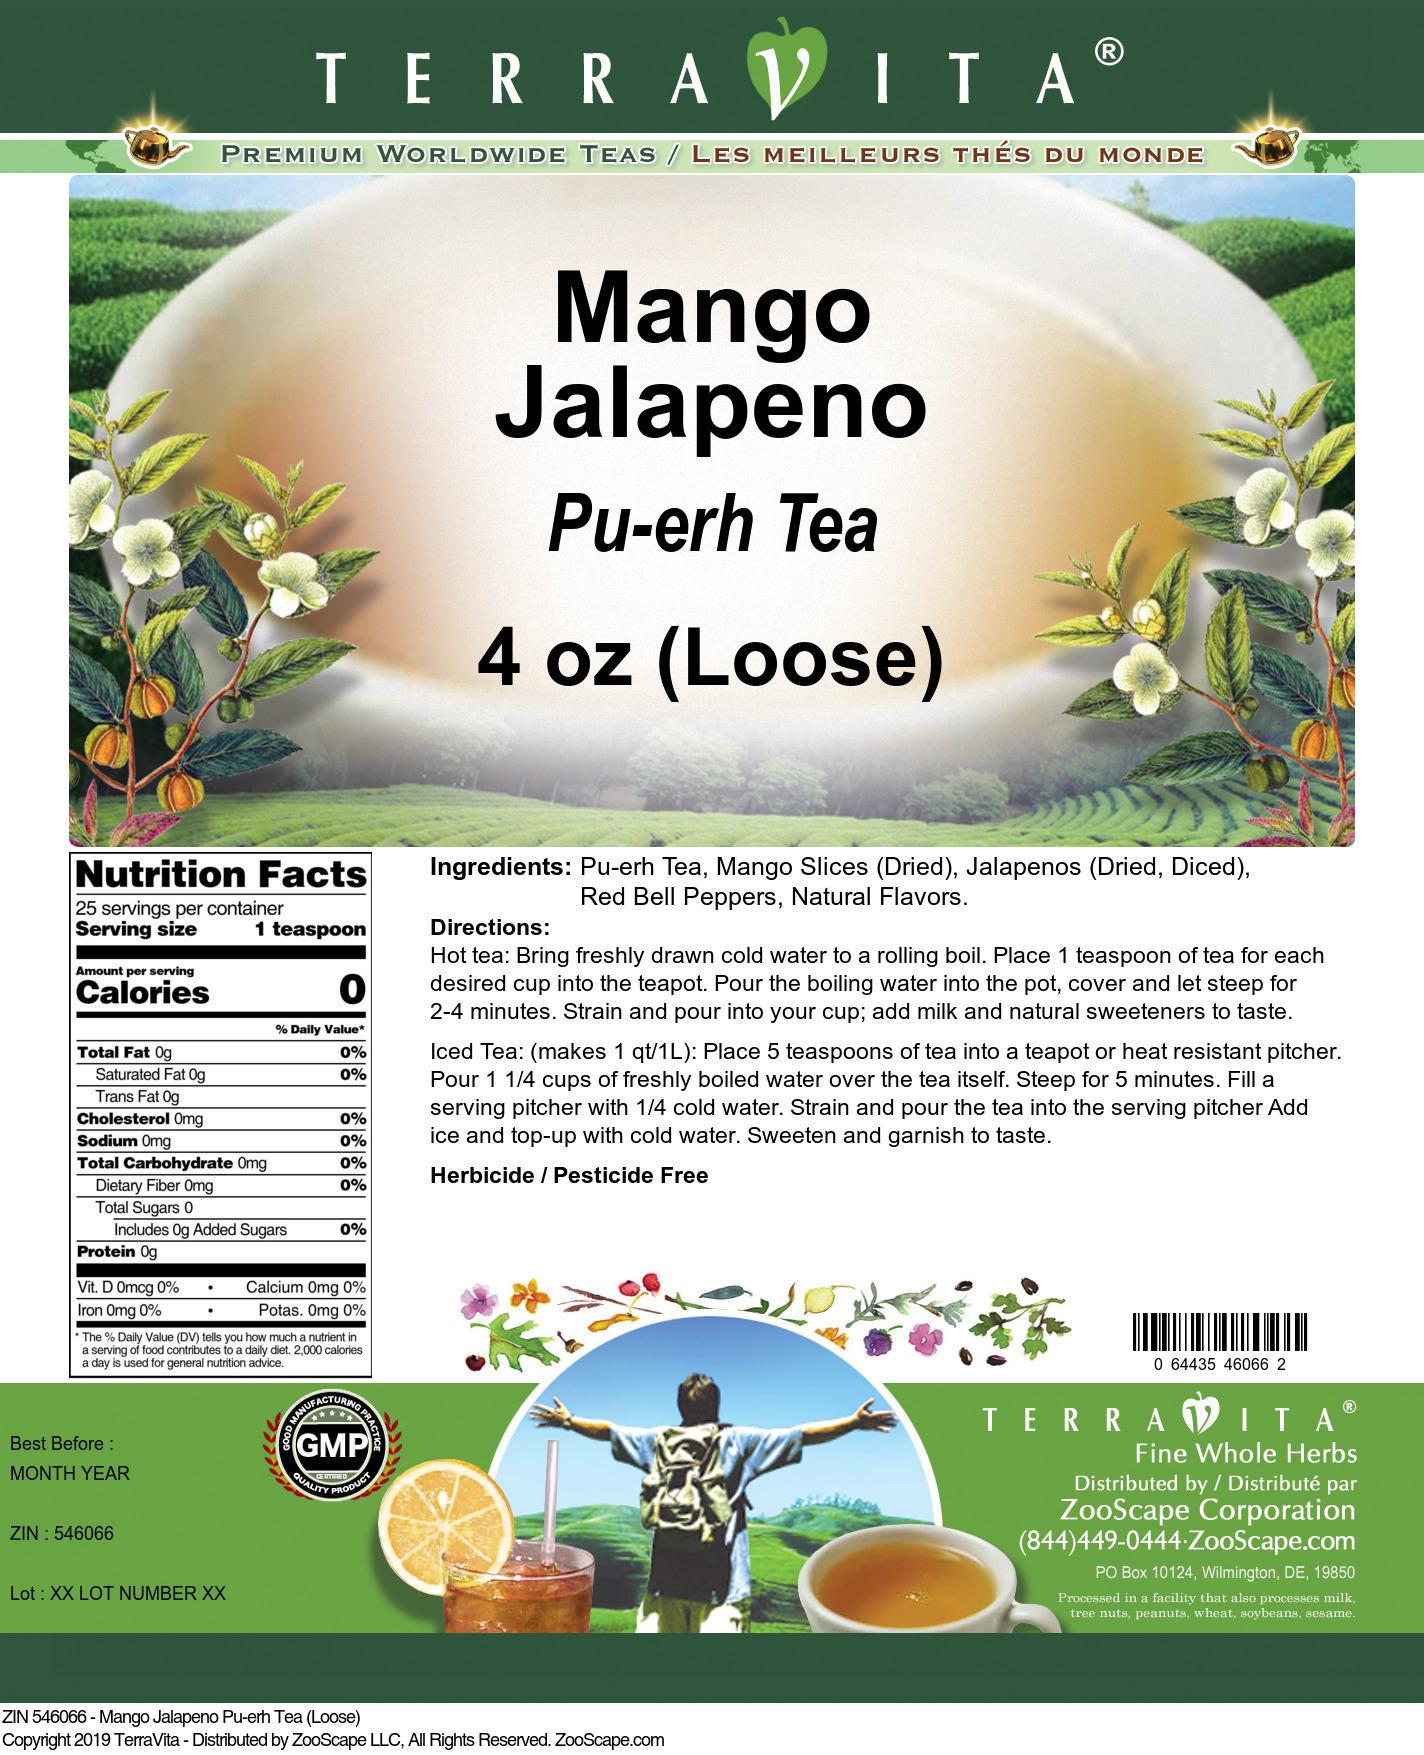 Mango Jalapeno Pu-erh Tea